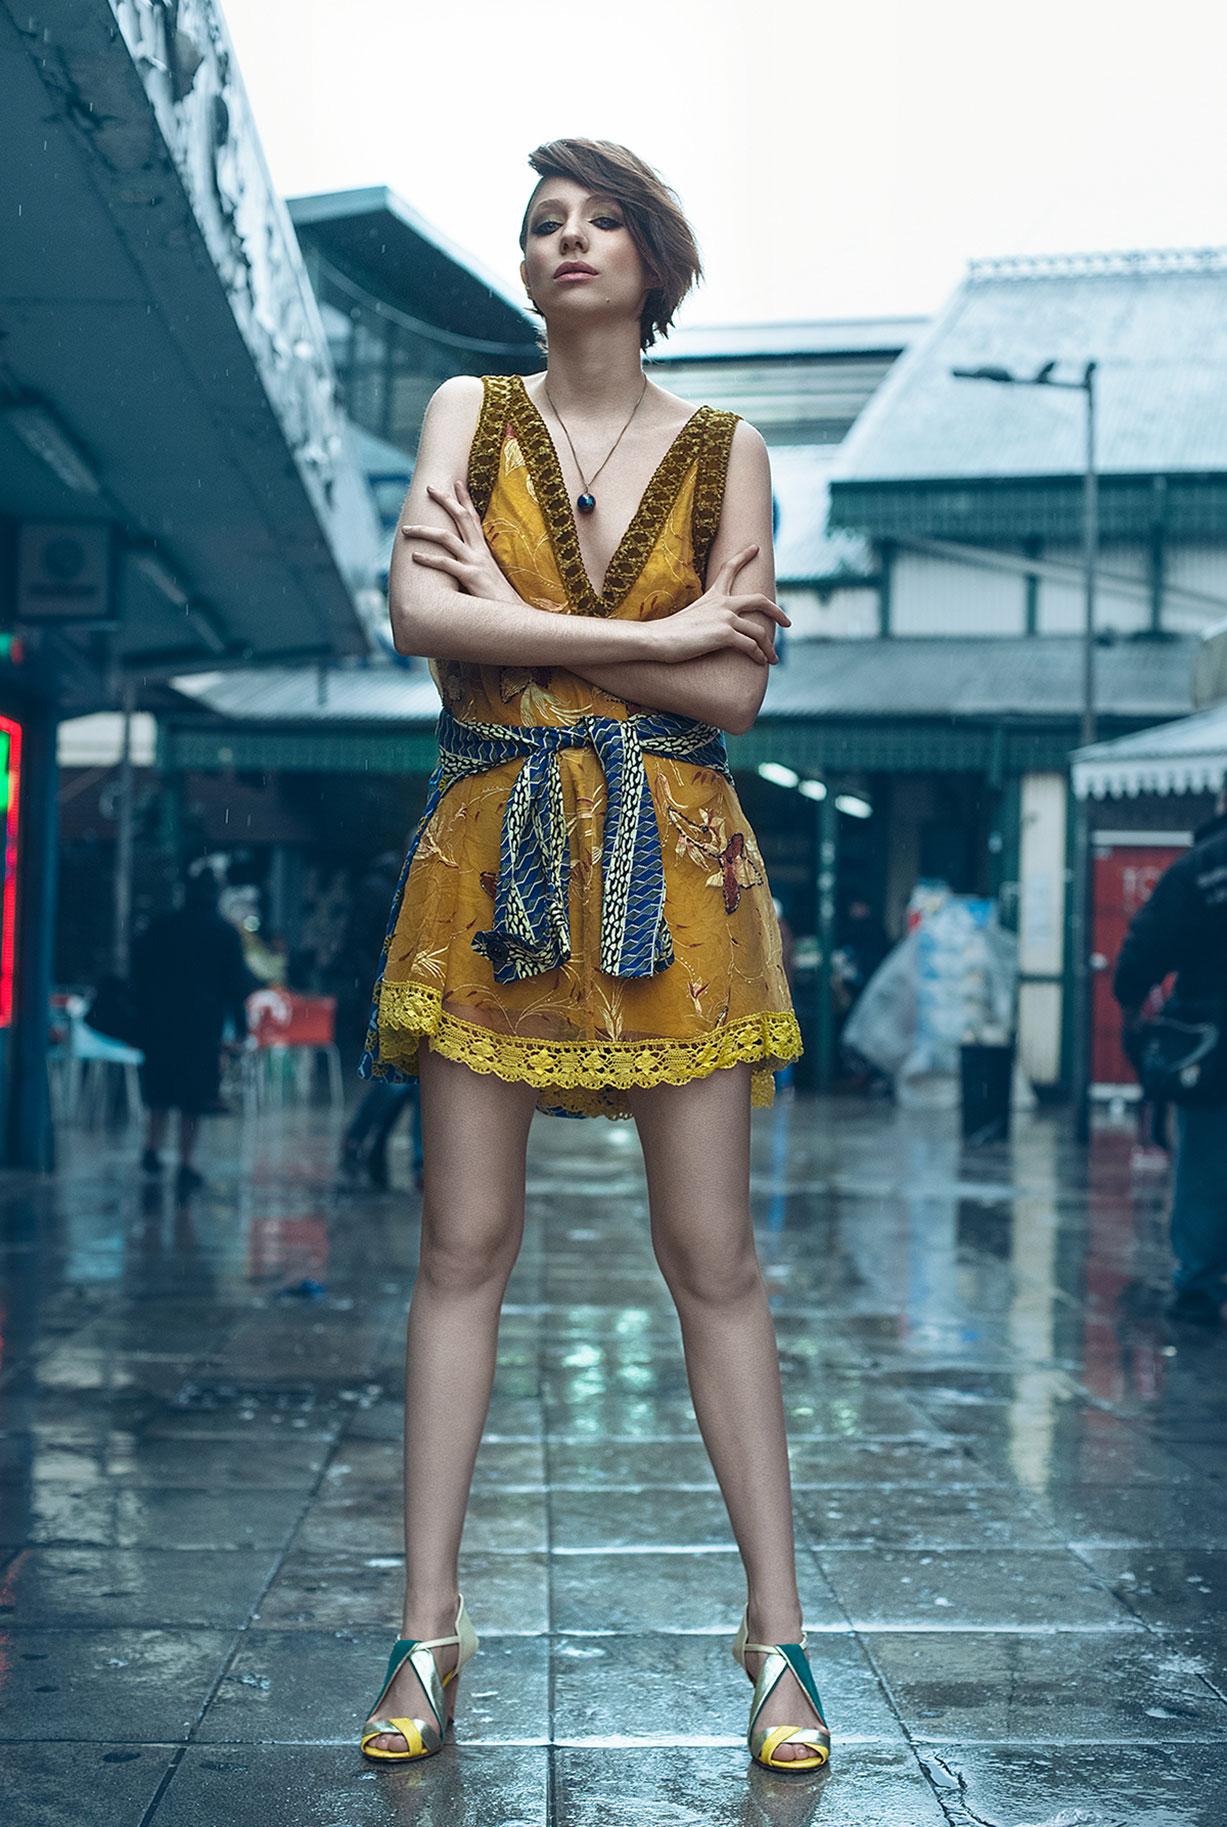 Одежда модного бренда Guevara Ocampo на фотомодели Carla Podesta, фотограф Alejandro Bauducco